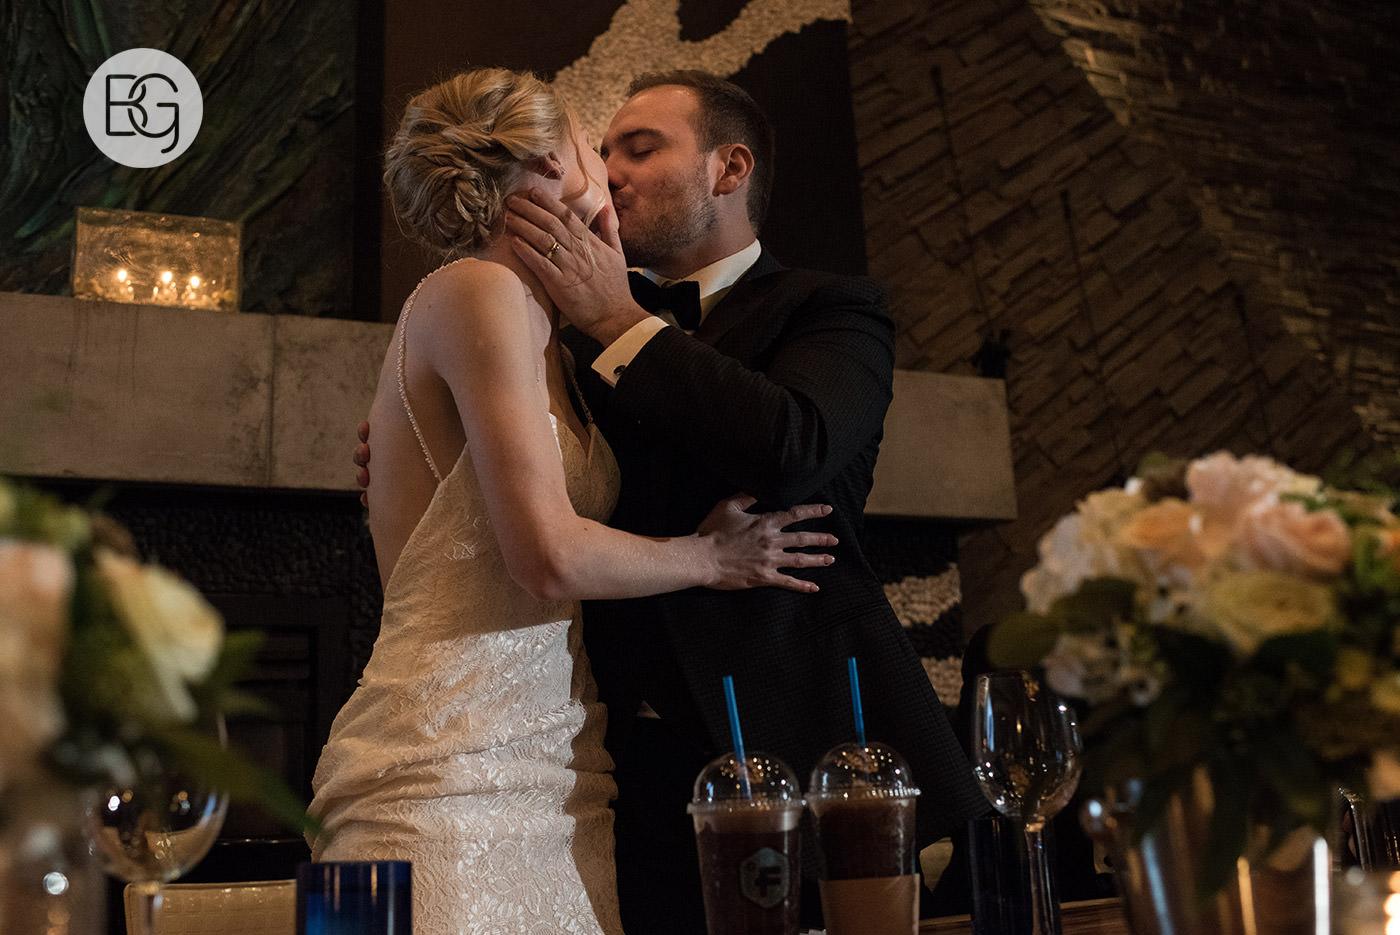 Edmonton_wedding_photographers_josh_sara_whyte_35.jpg